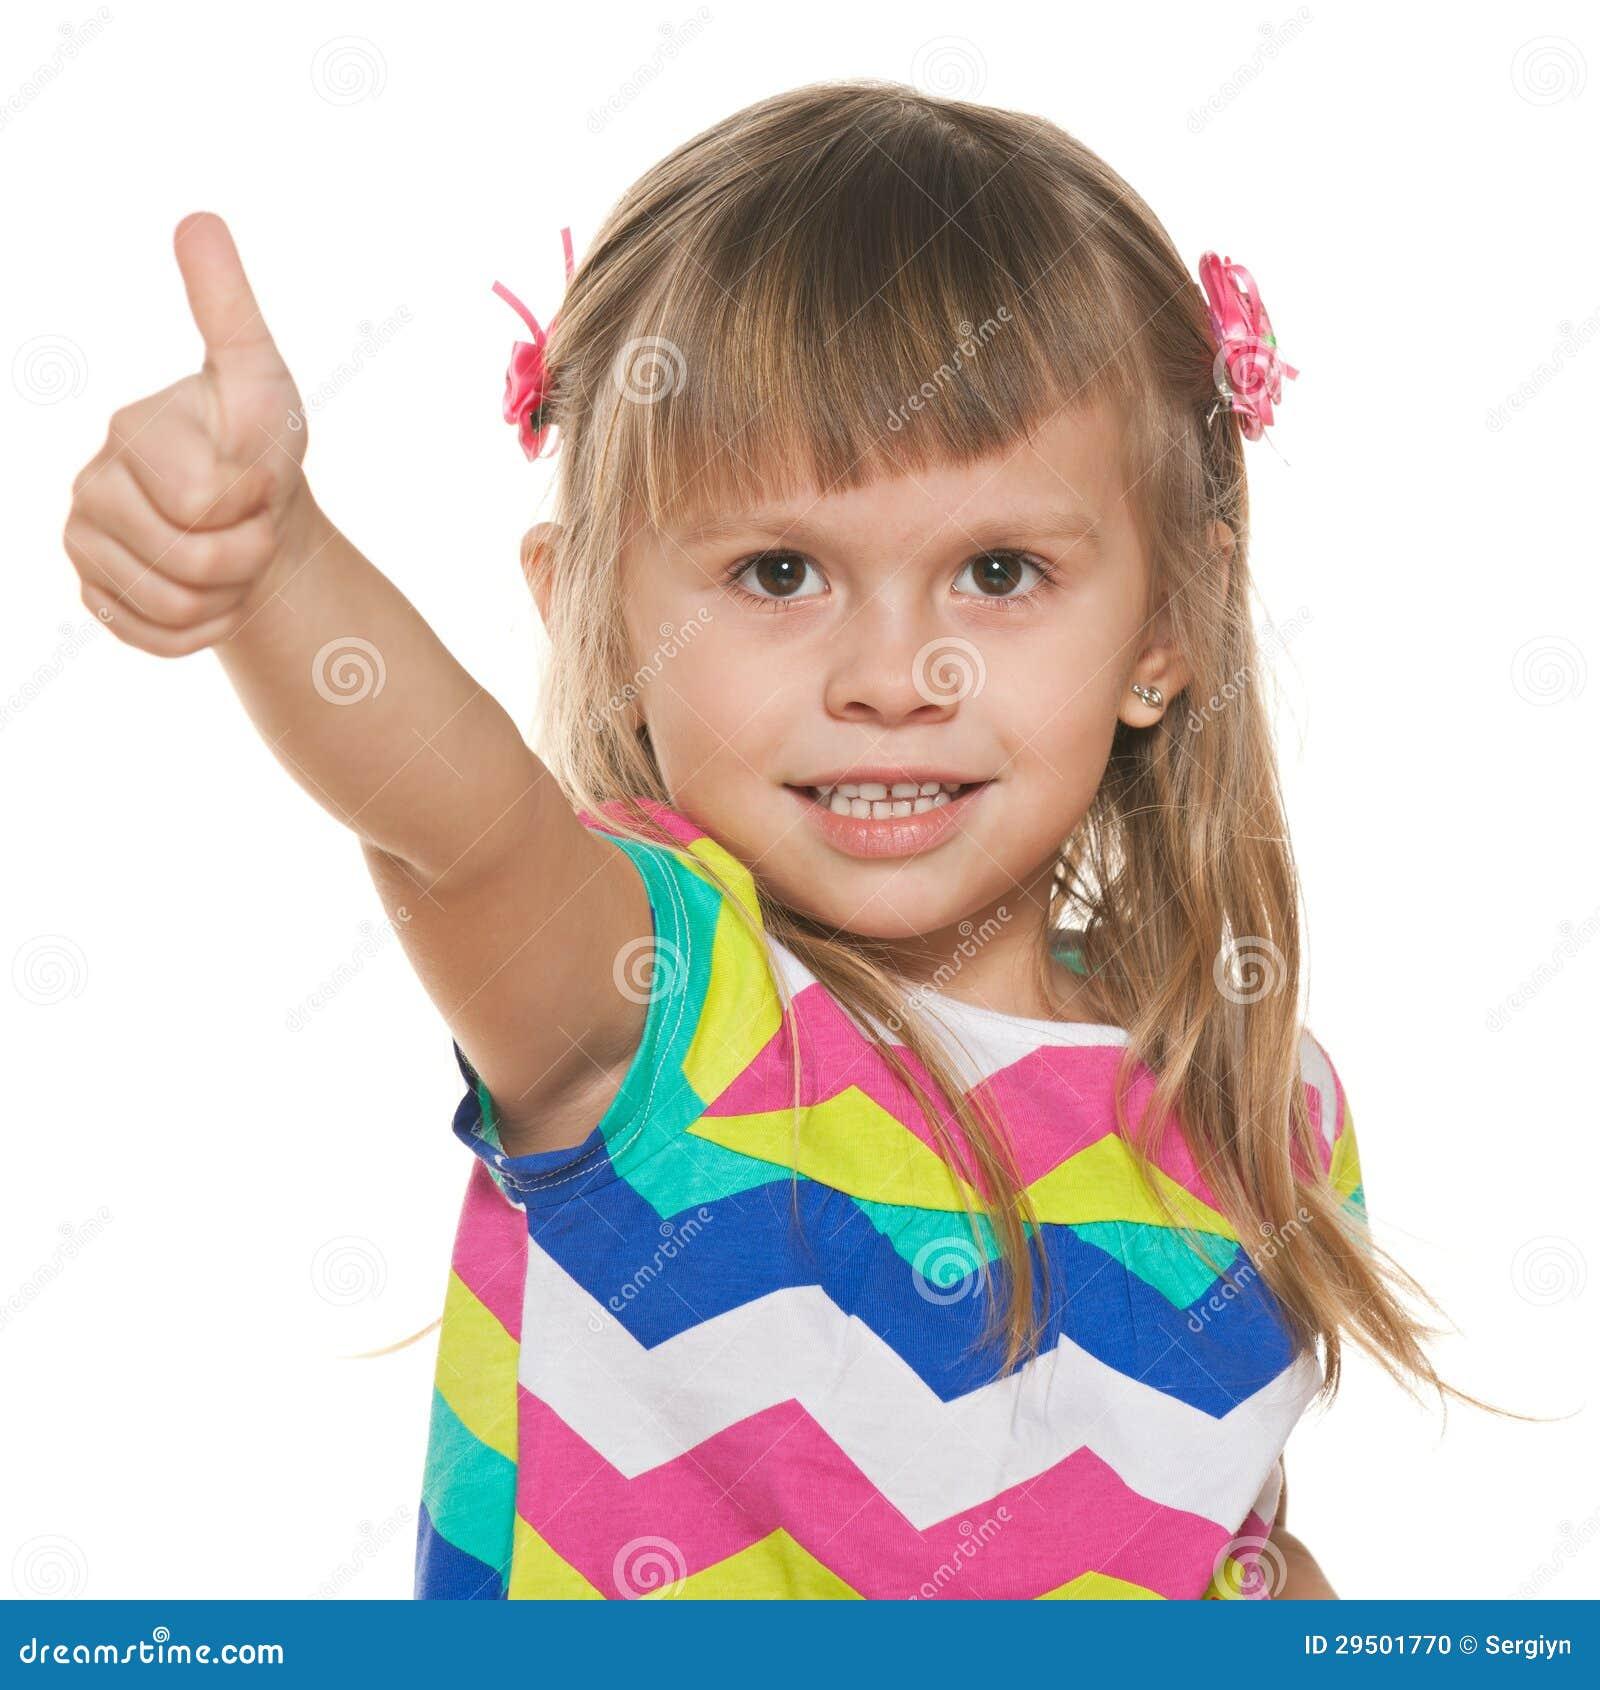 Glimlachend meisje met haar omhoog duim